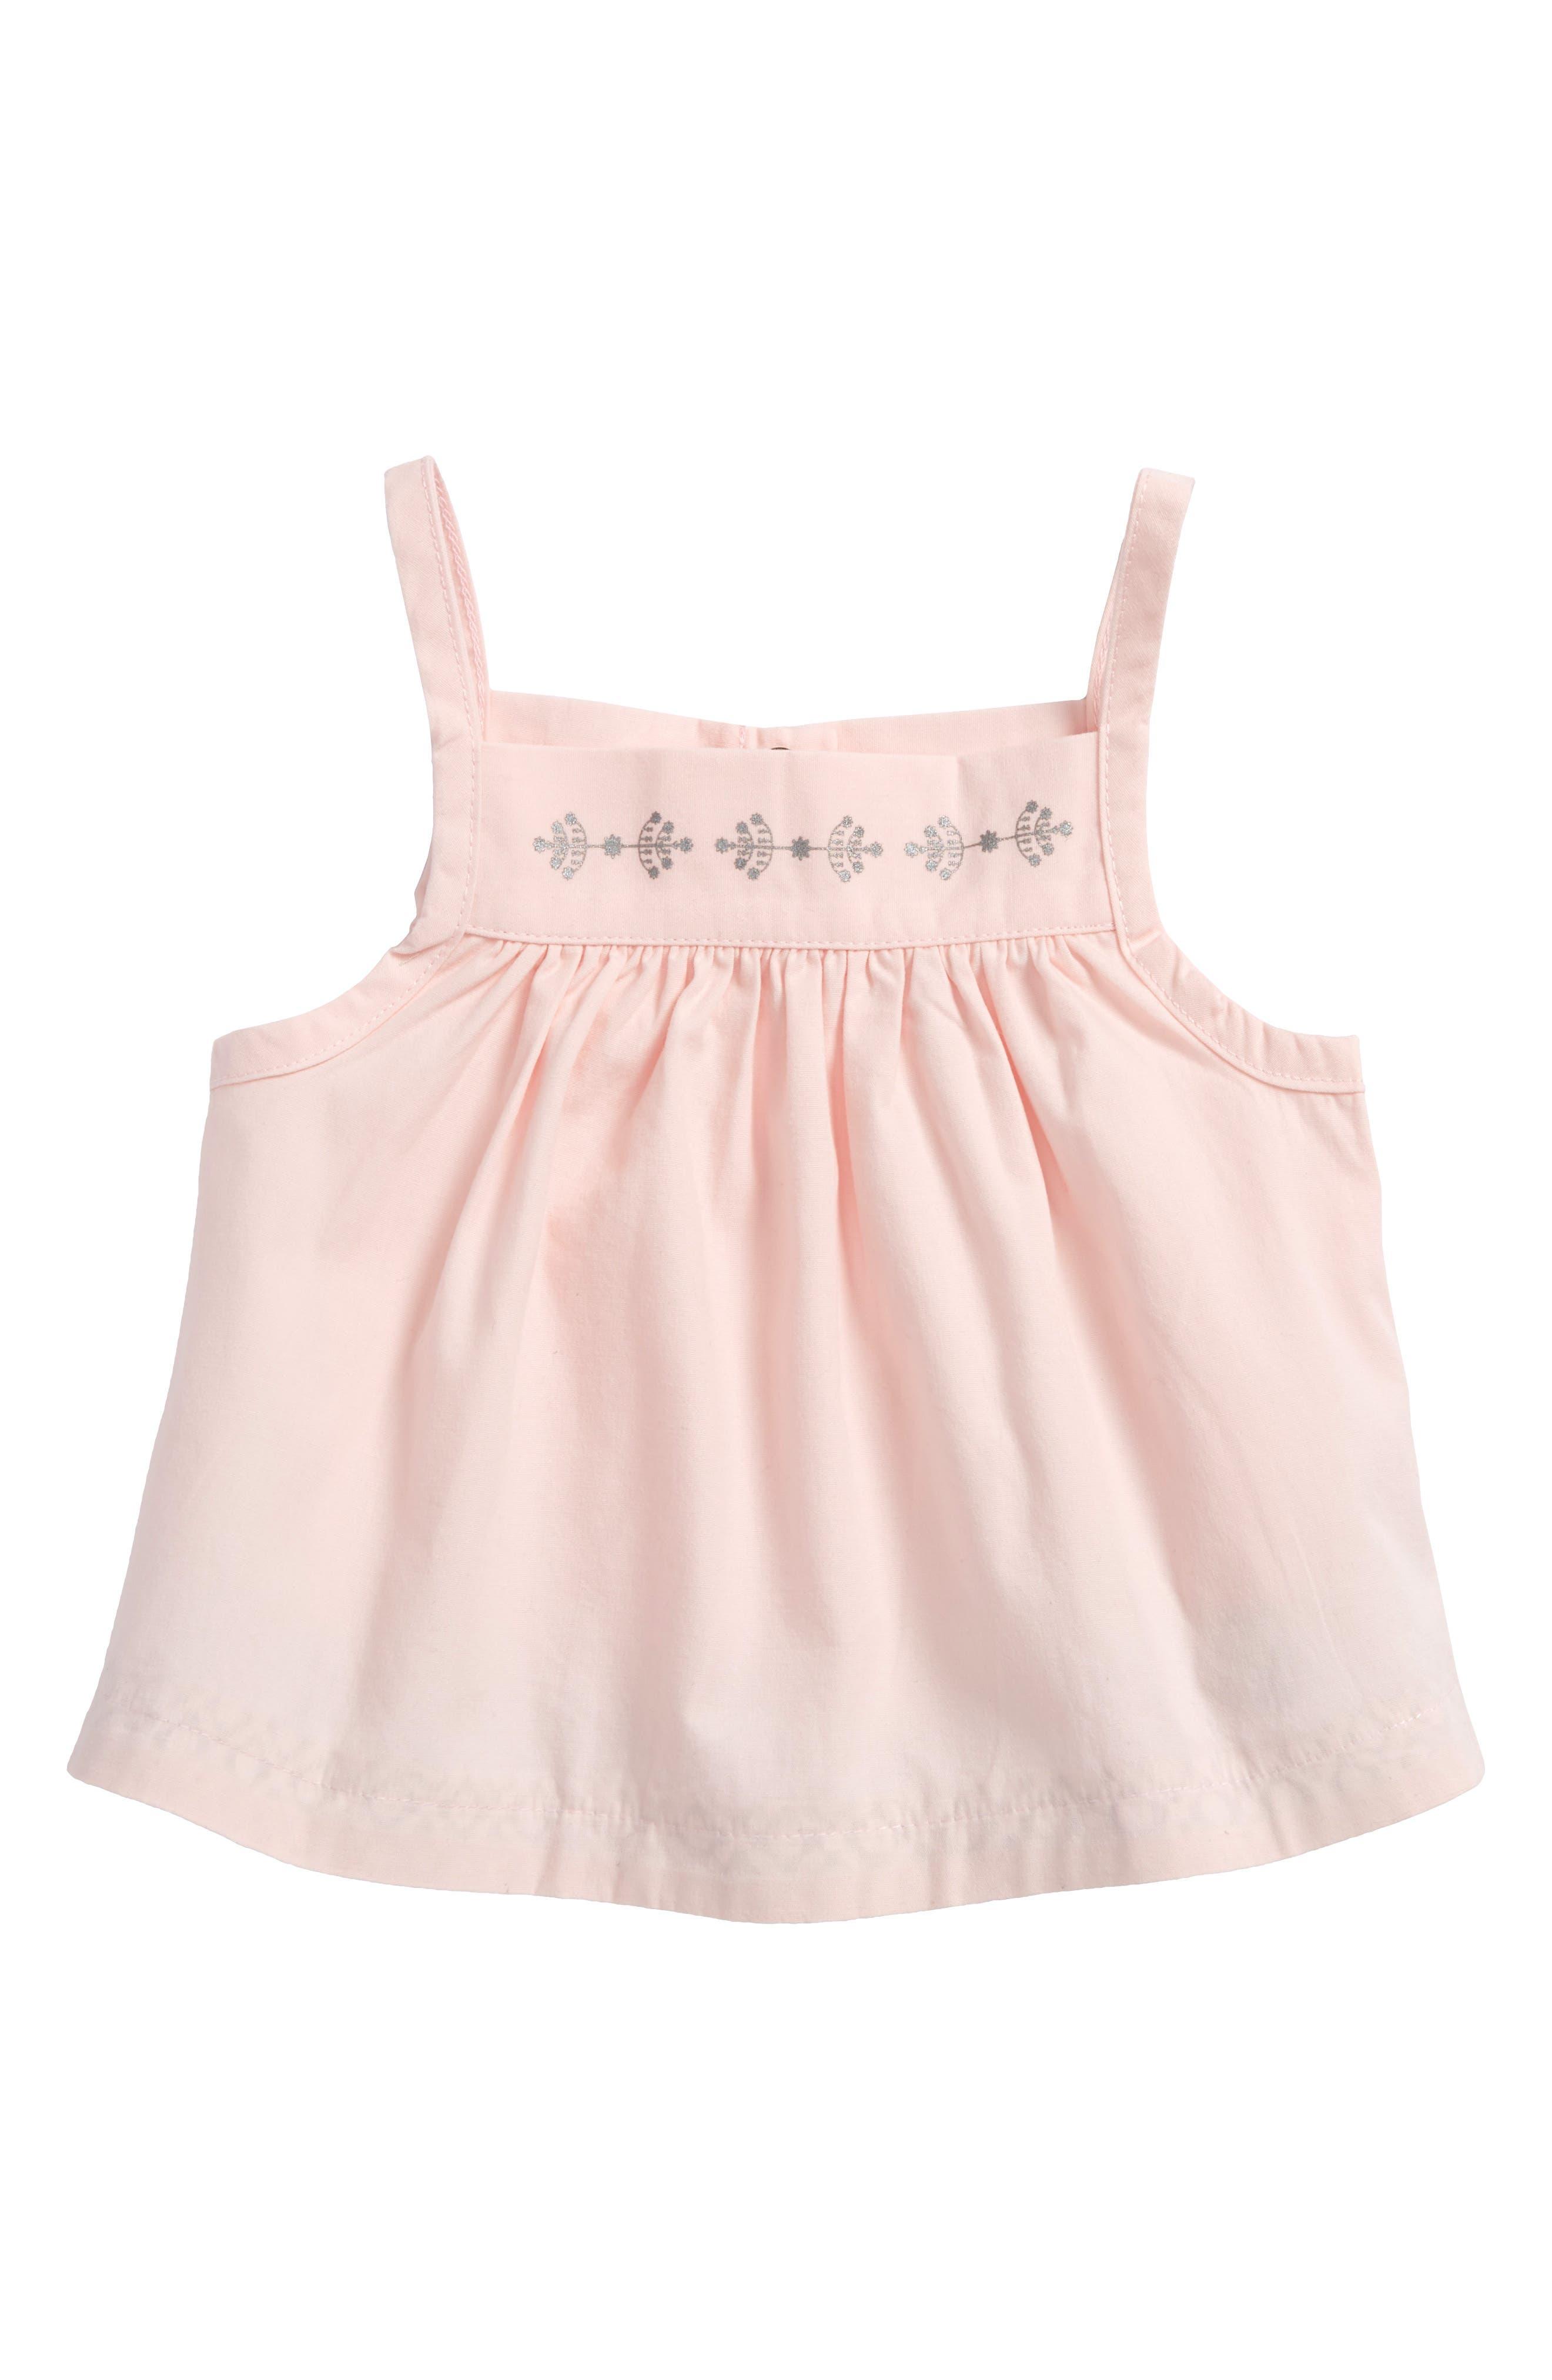 Swing Top,                         Main,                         color, Pink